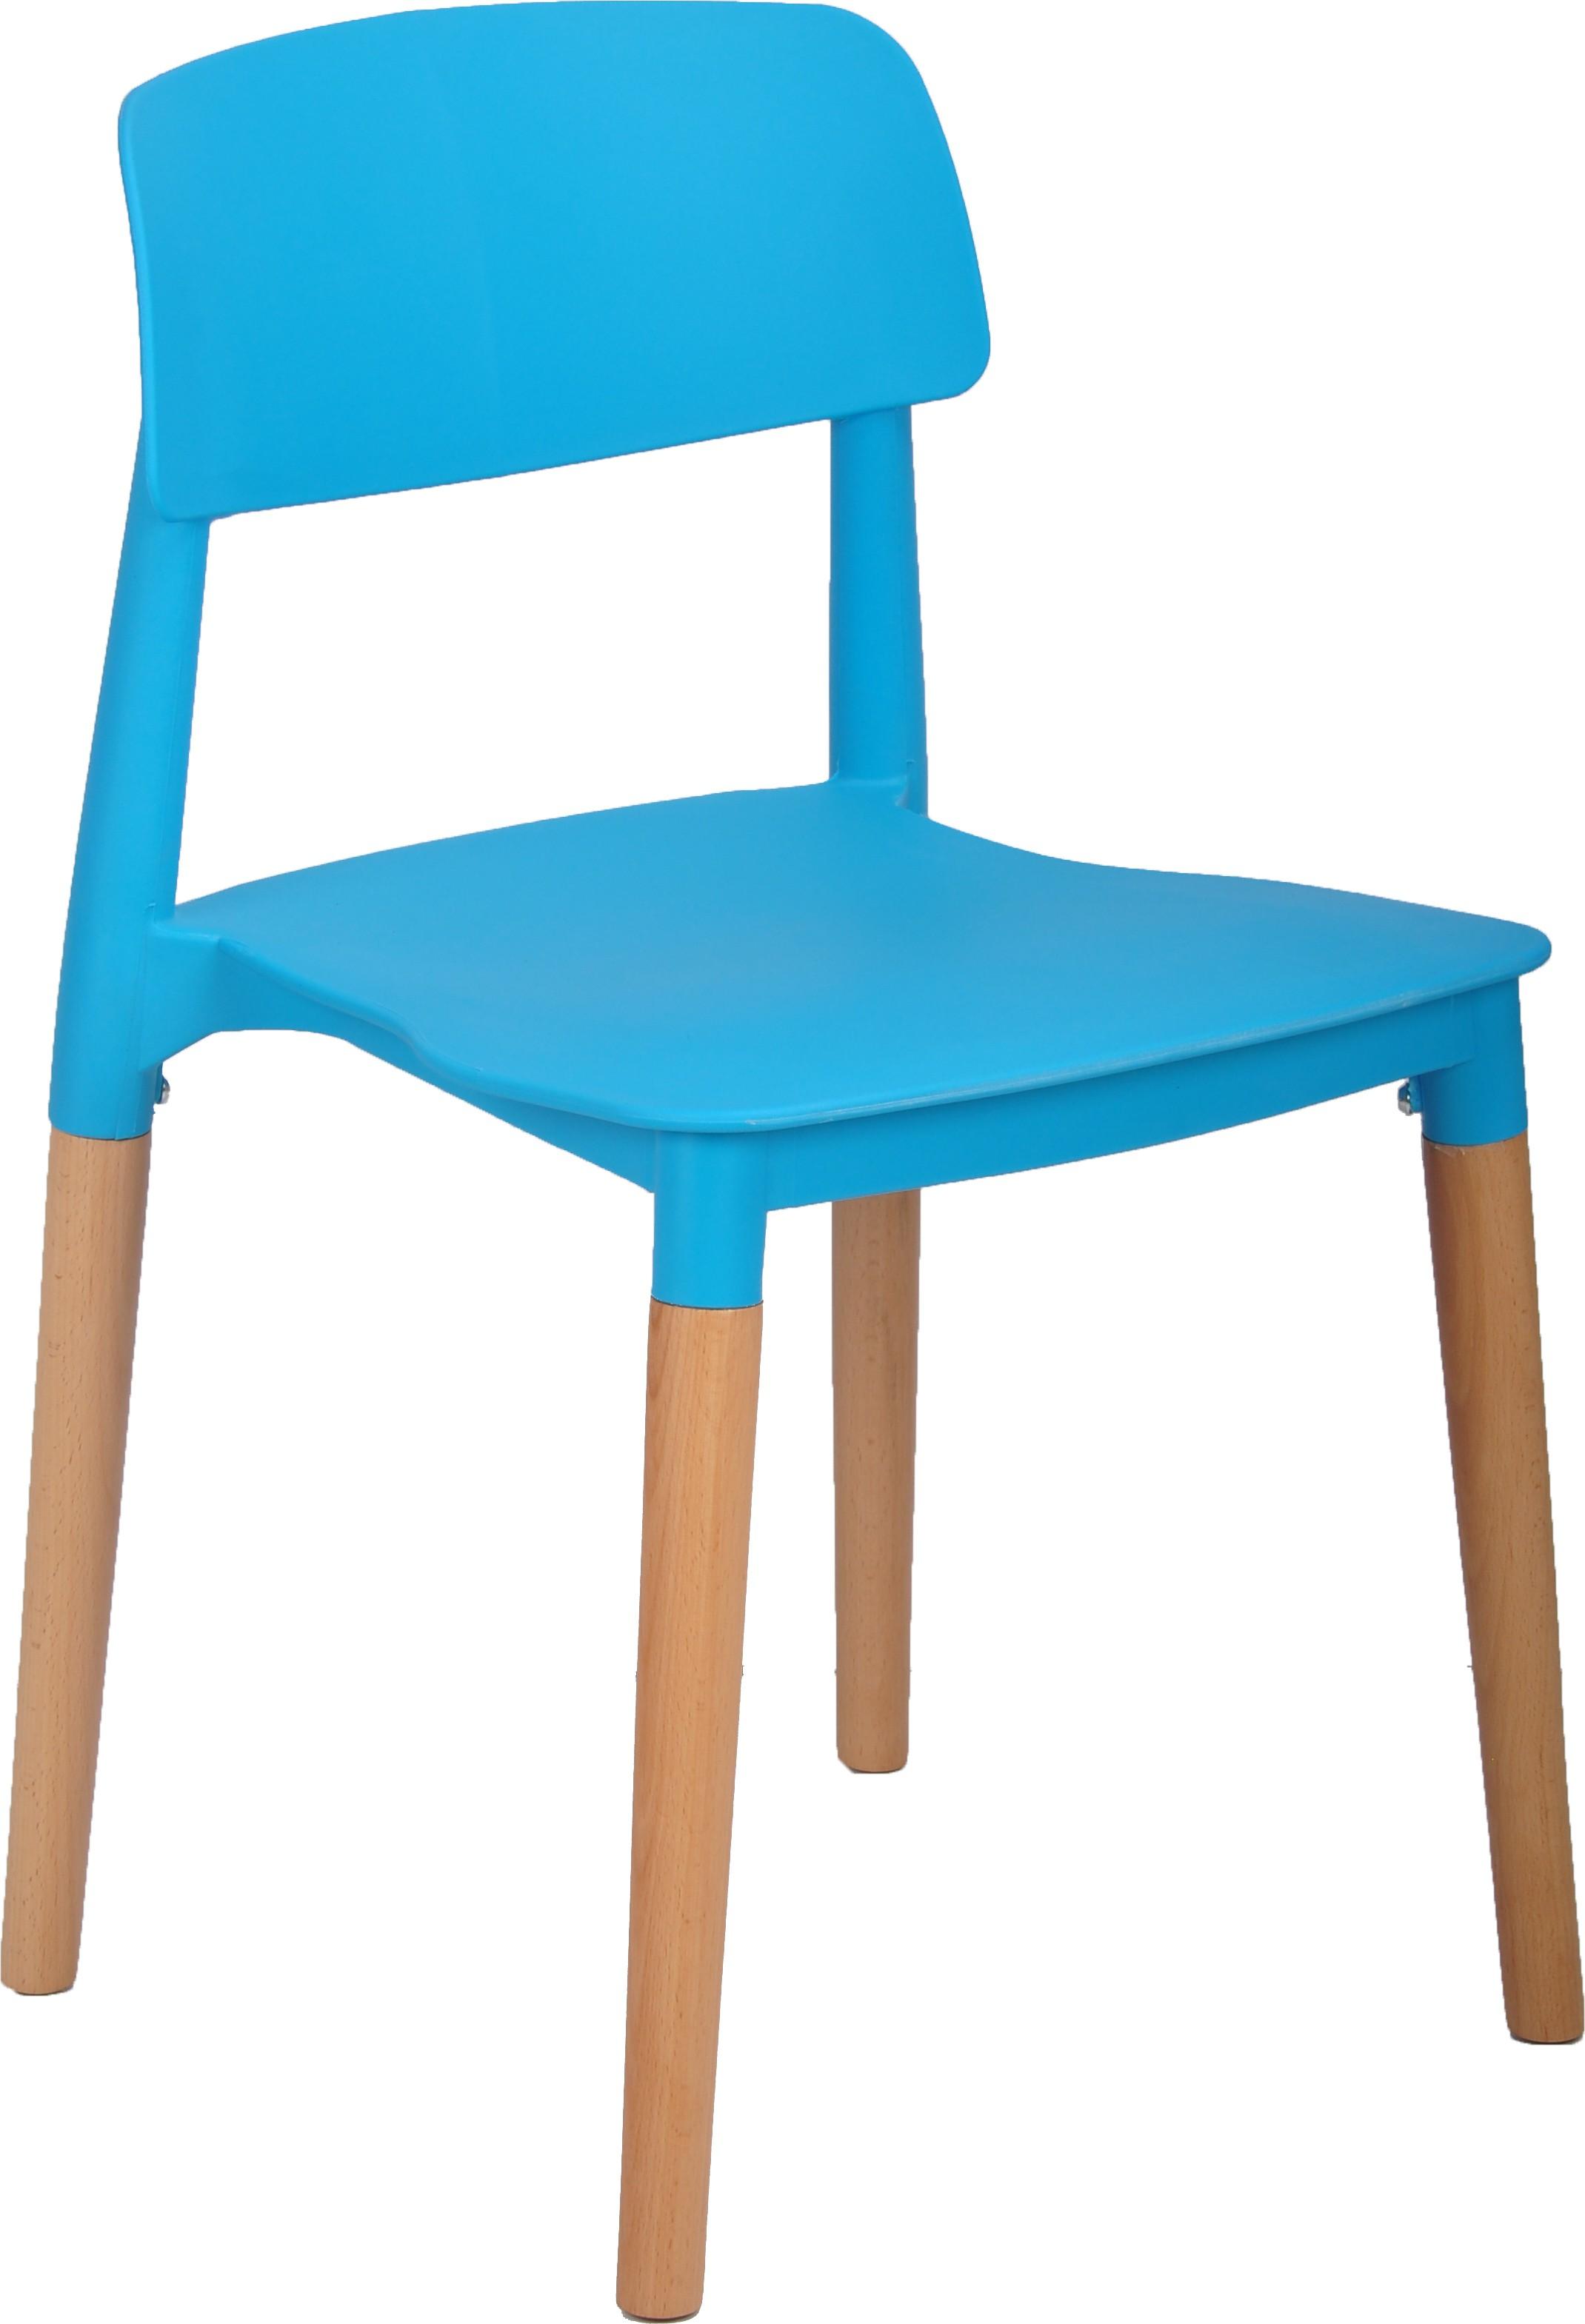 View Bharat Furniture Click Plastic Living Room Chair(Finish Color - Blue) Furniture (Bharat Furniture)